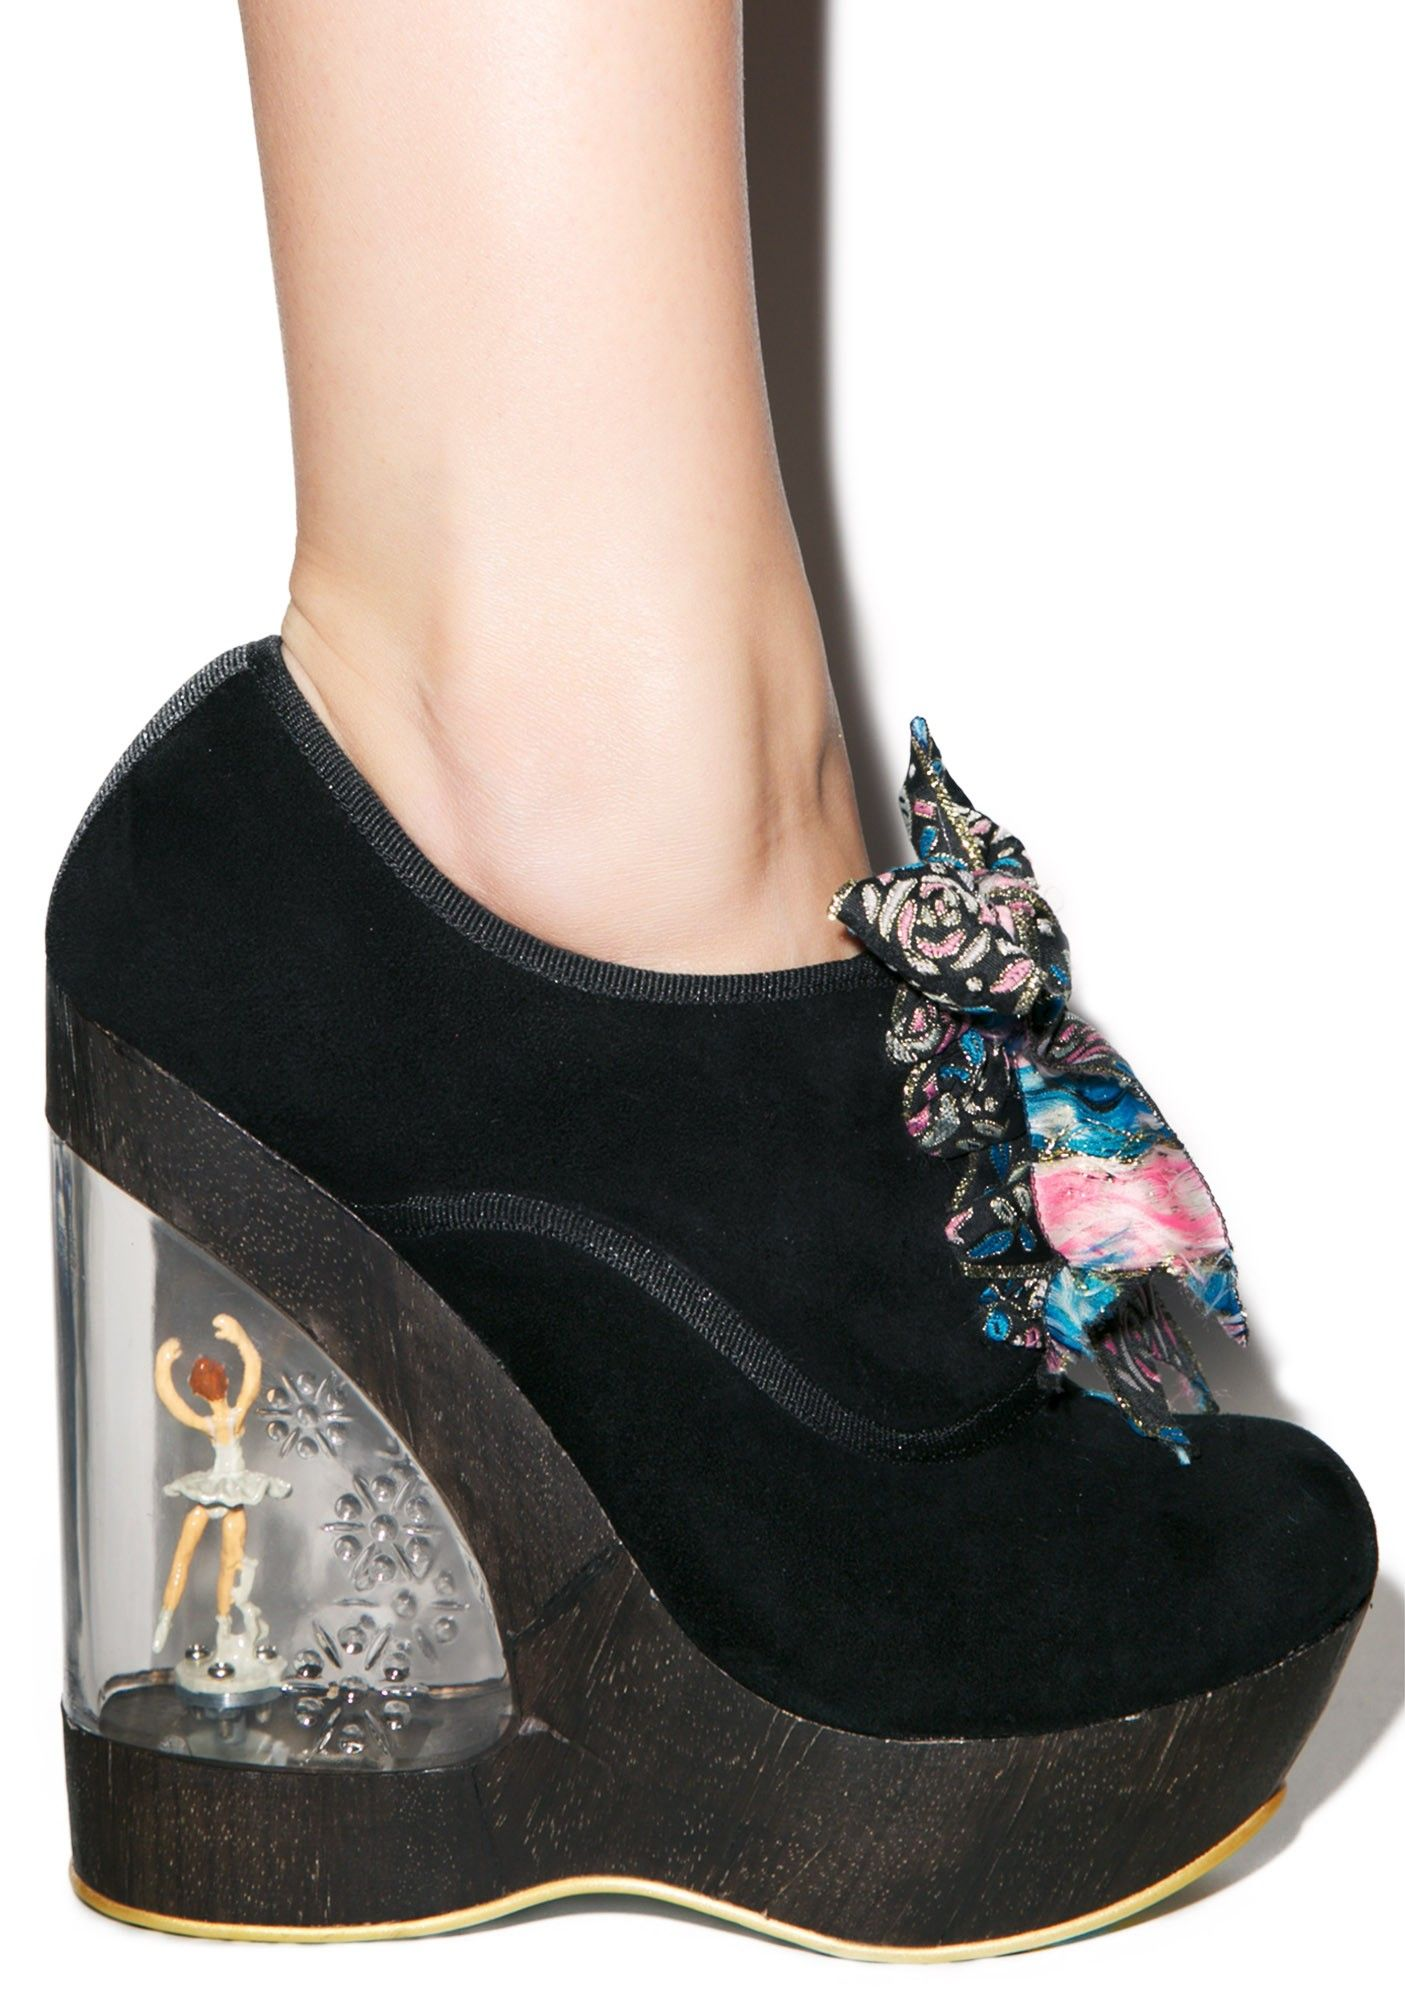 Glissade Ballerina Wedges   Coolest shoes ever, Irregular